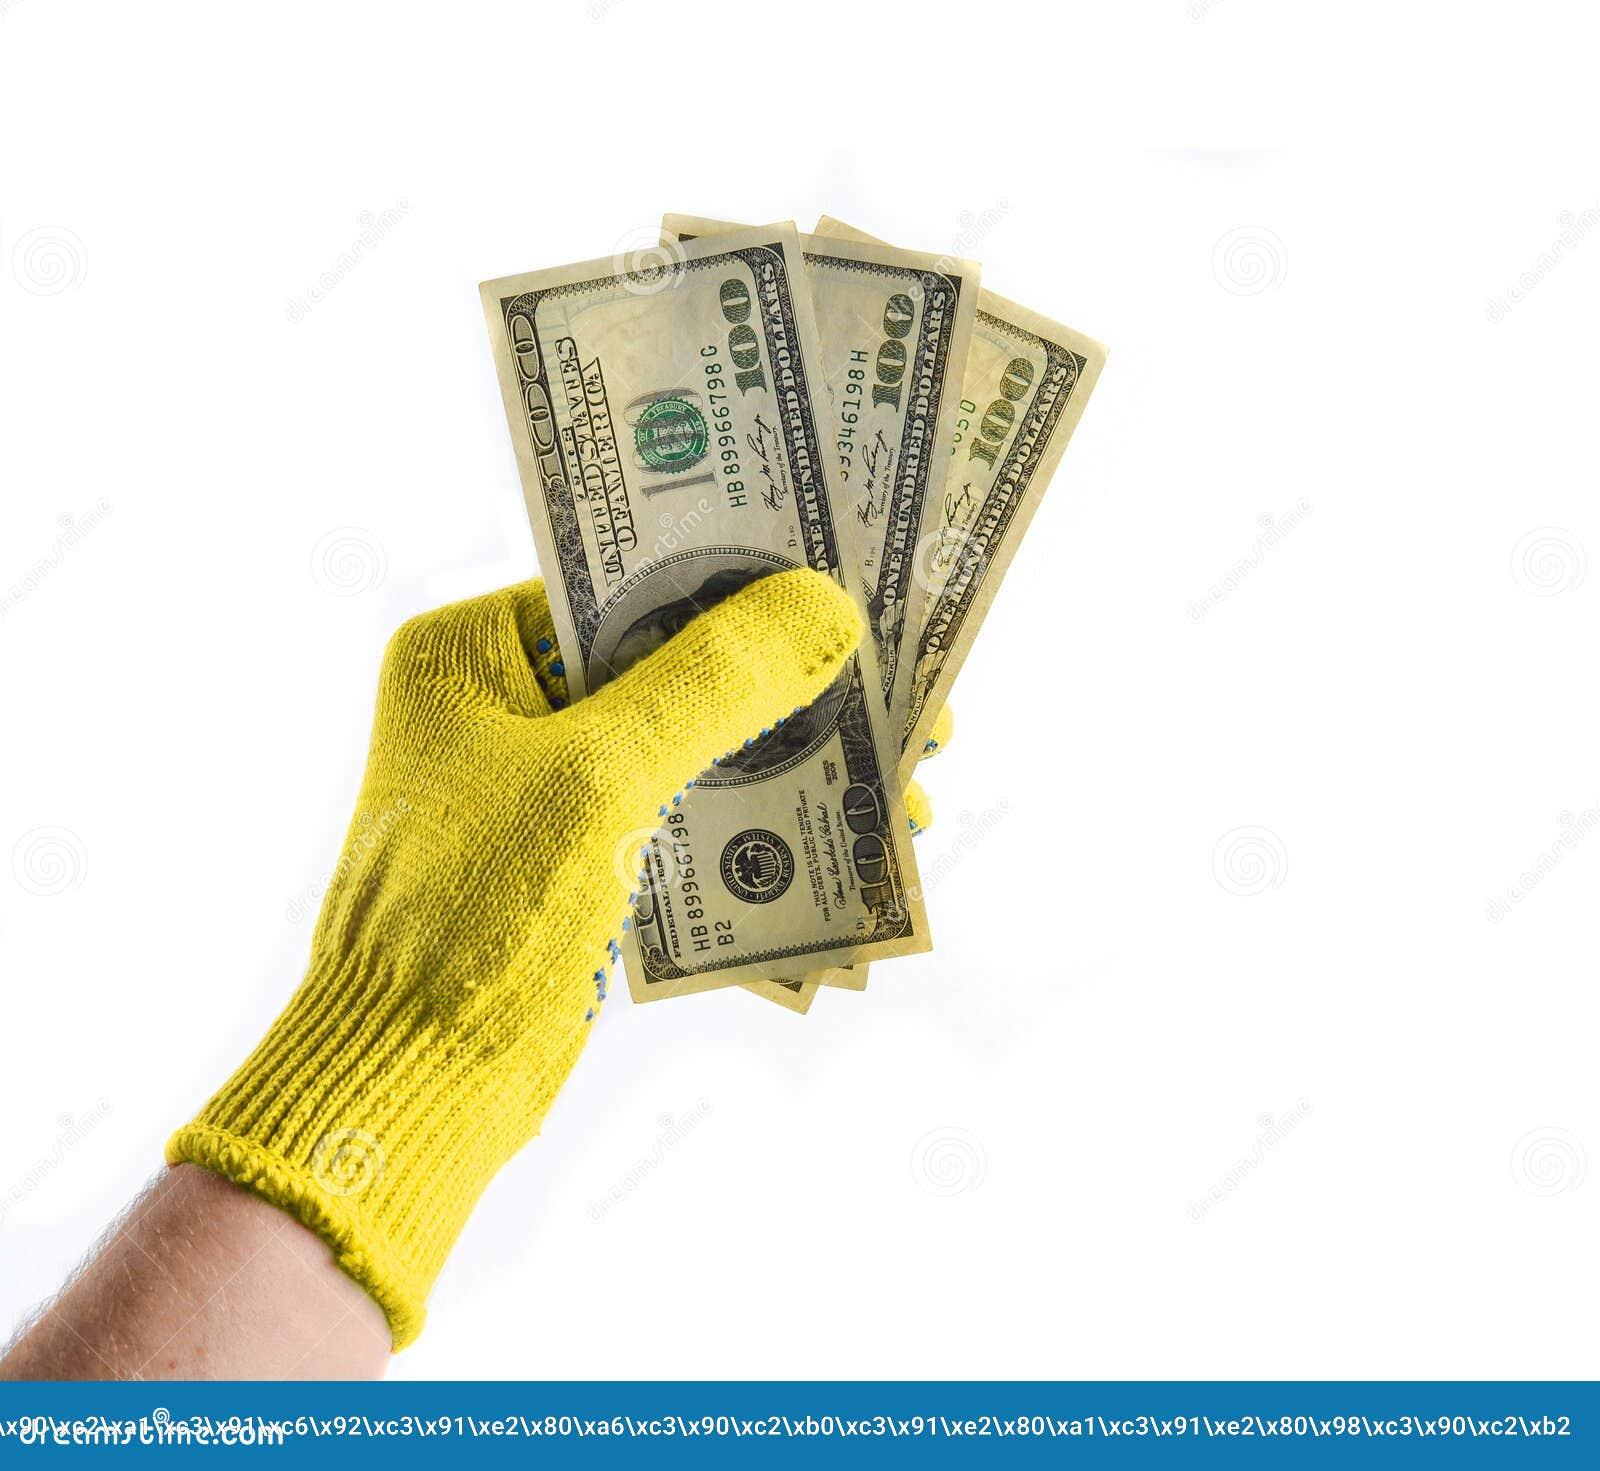 men's hands with orange work gloves hold hundreddollar